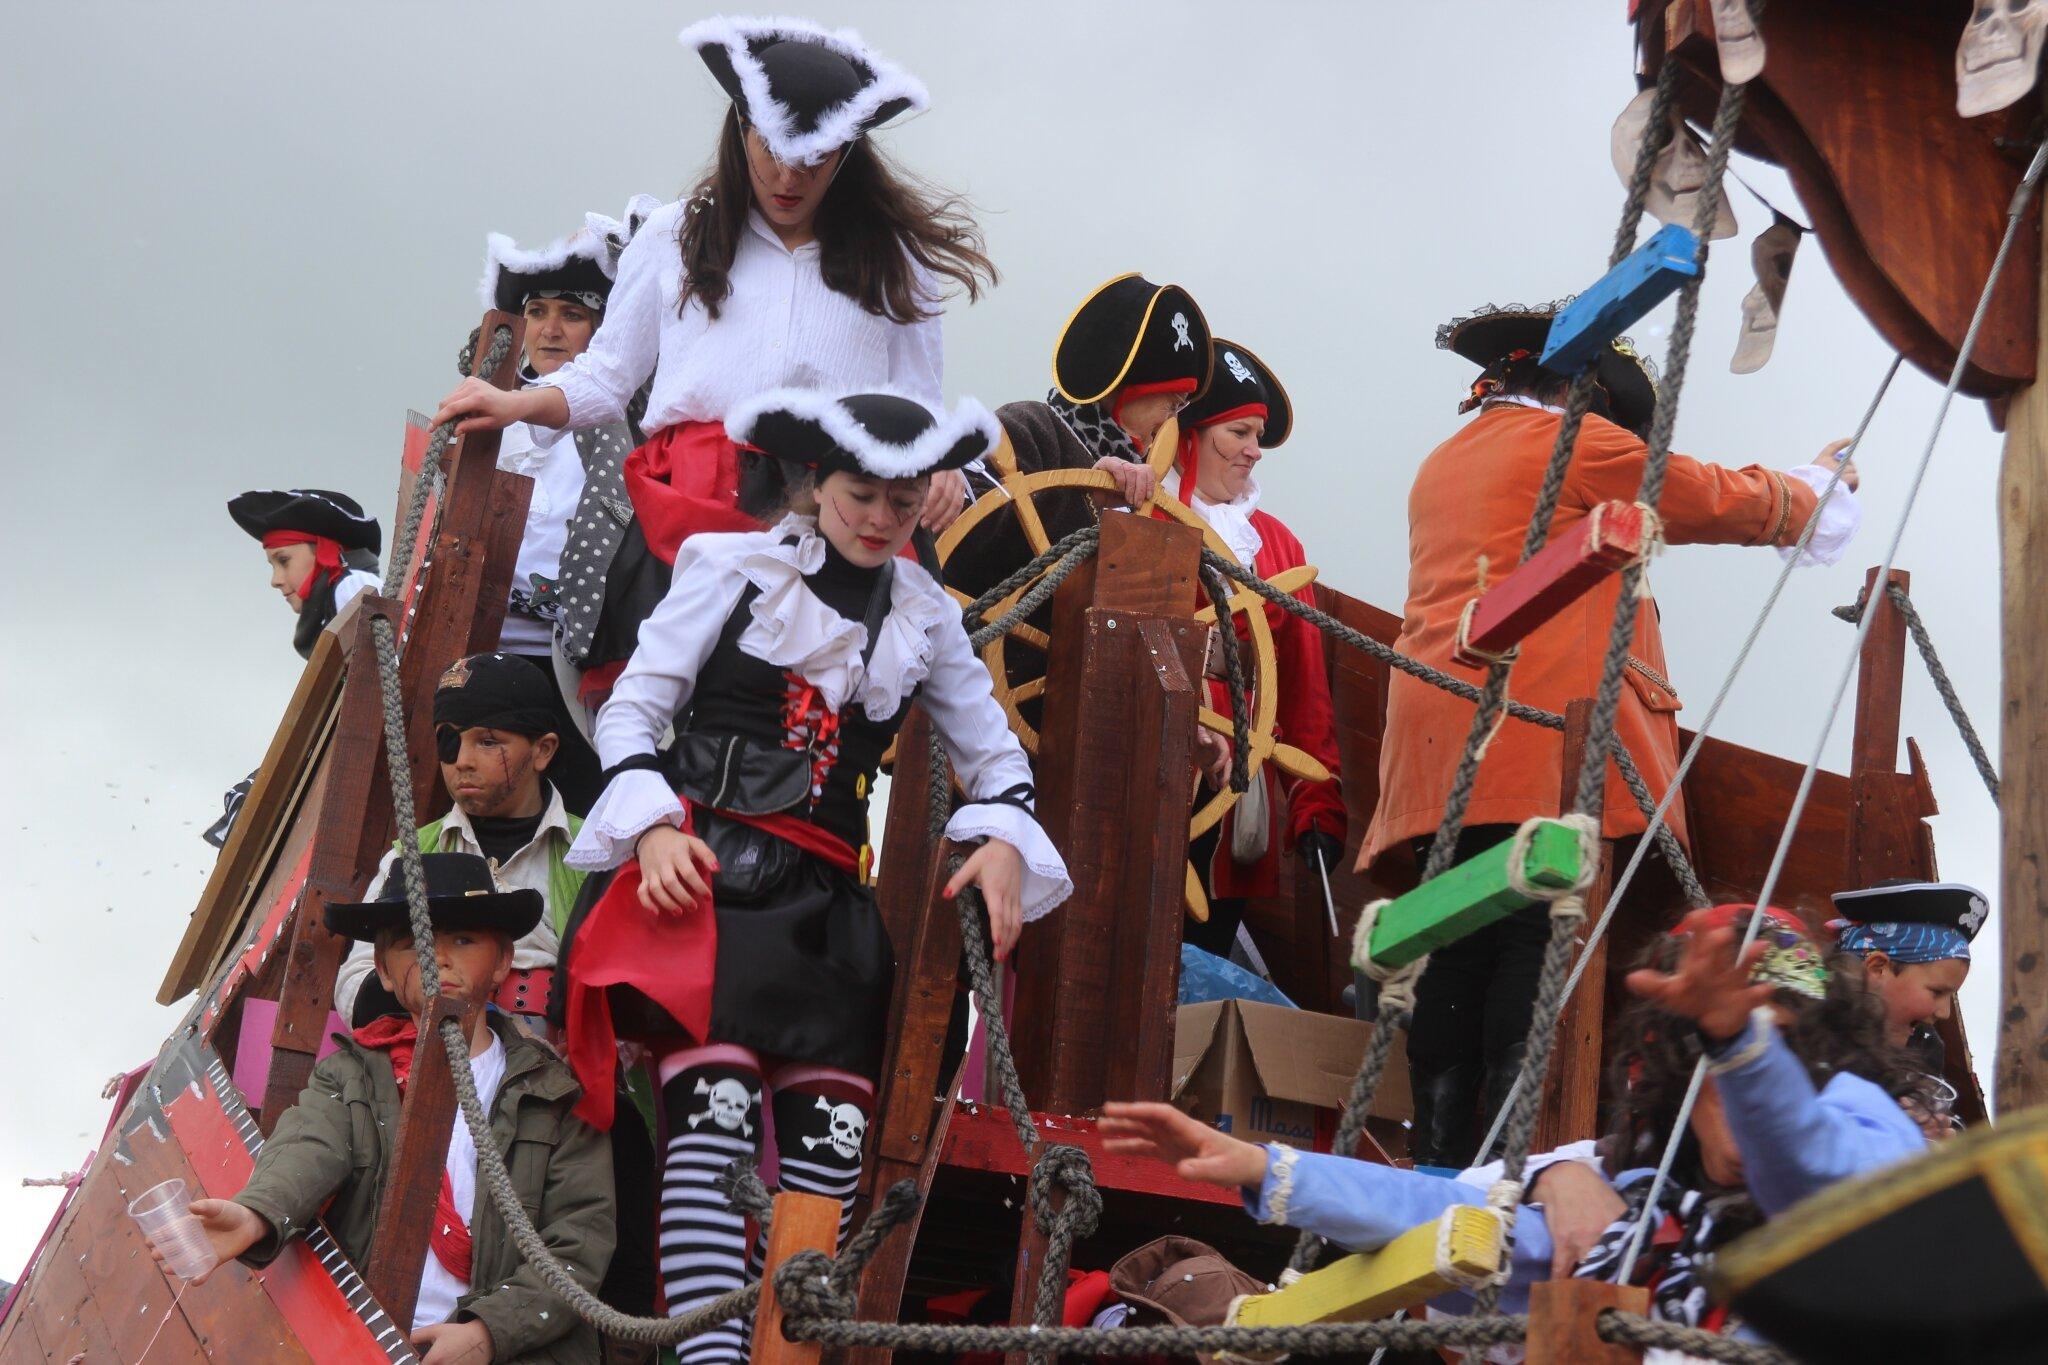 carnaval de landerneau 2014 050